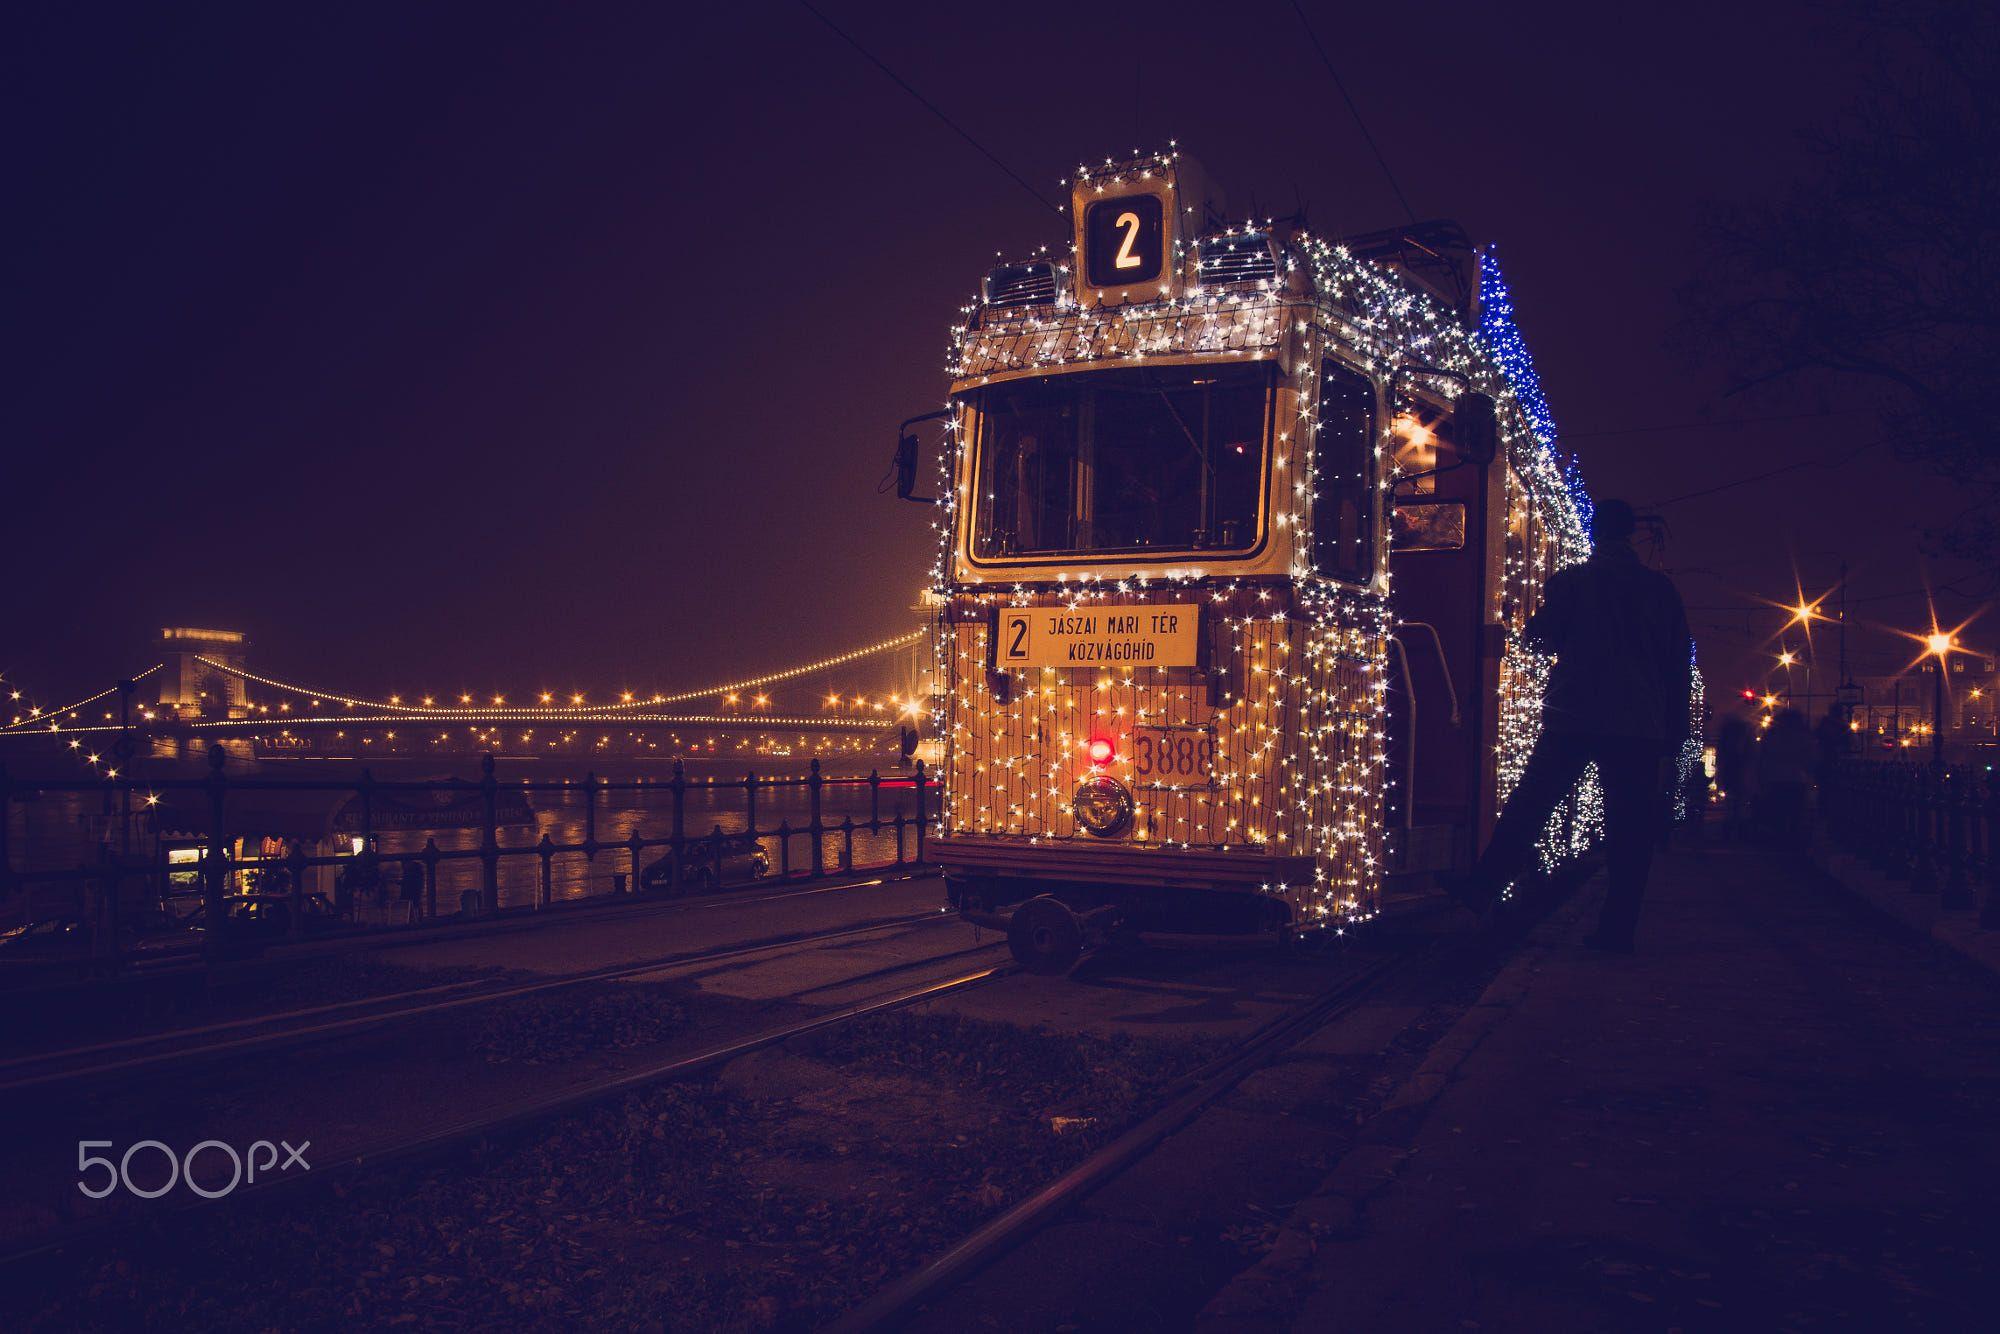 Christmas Light Tram in Budapest by Balázs Lukácsi on 500px